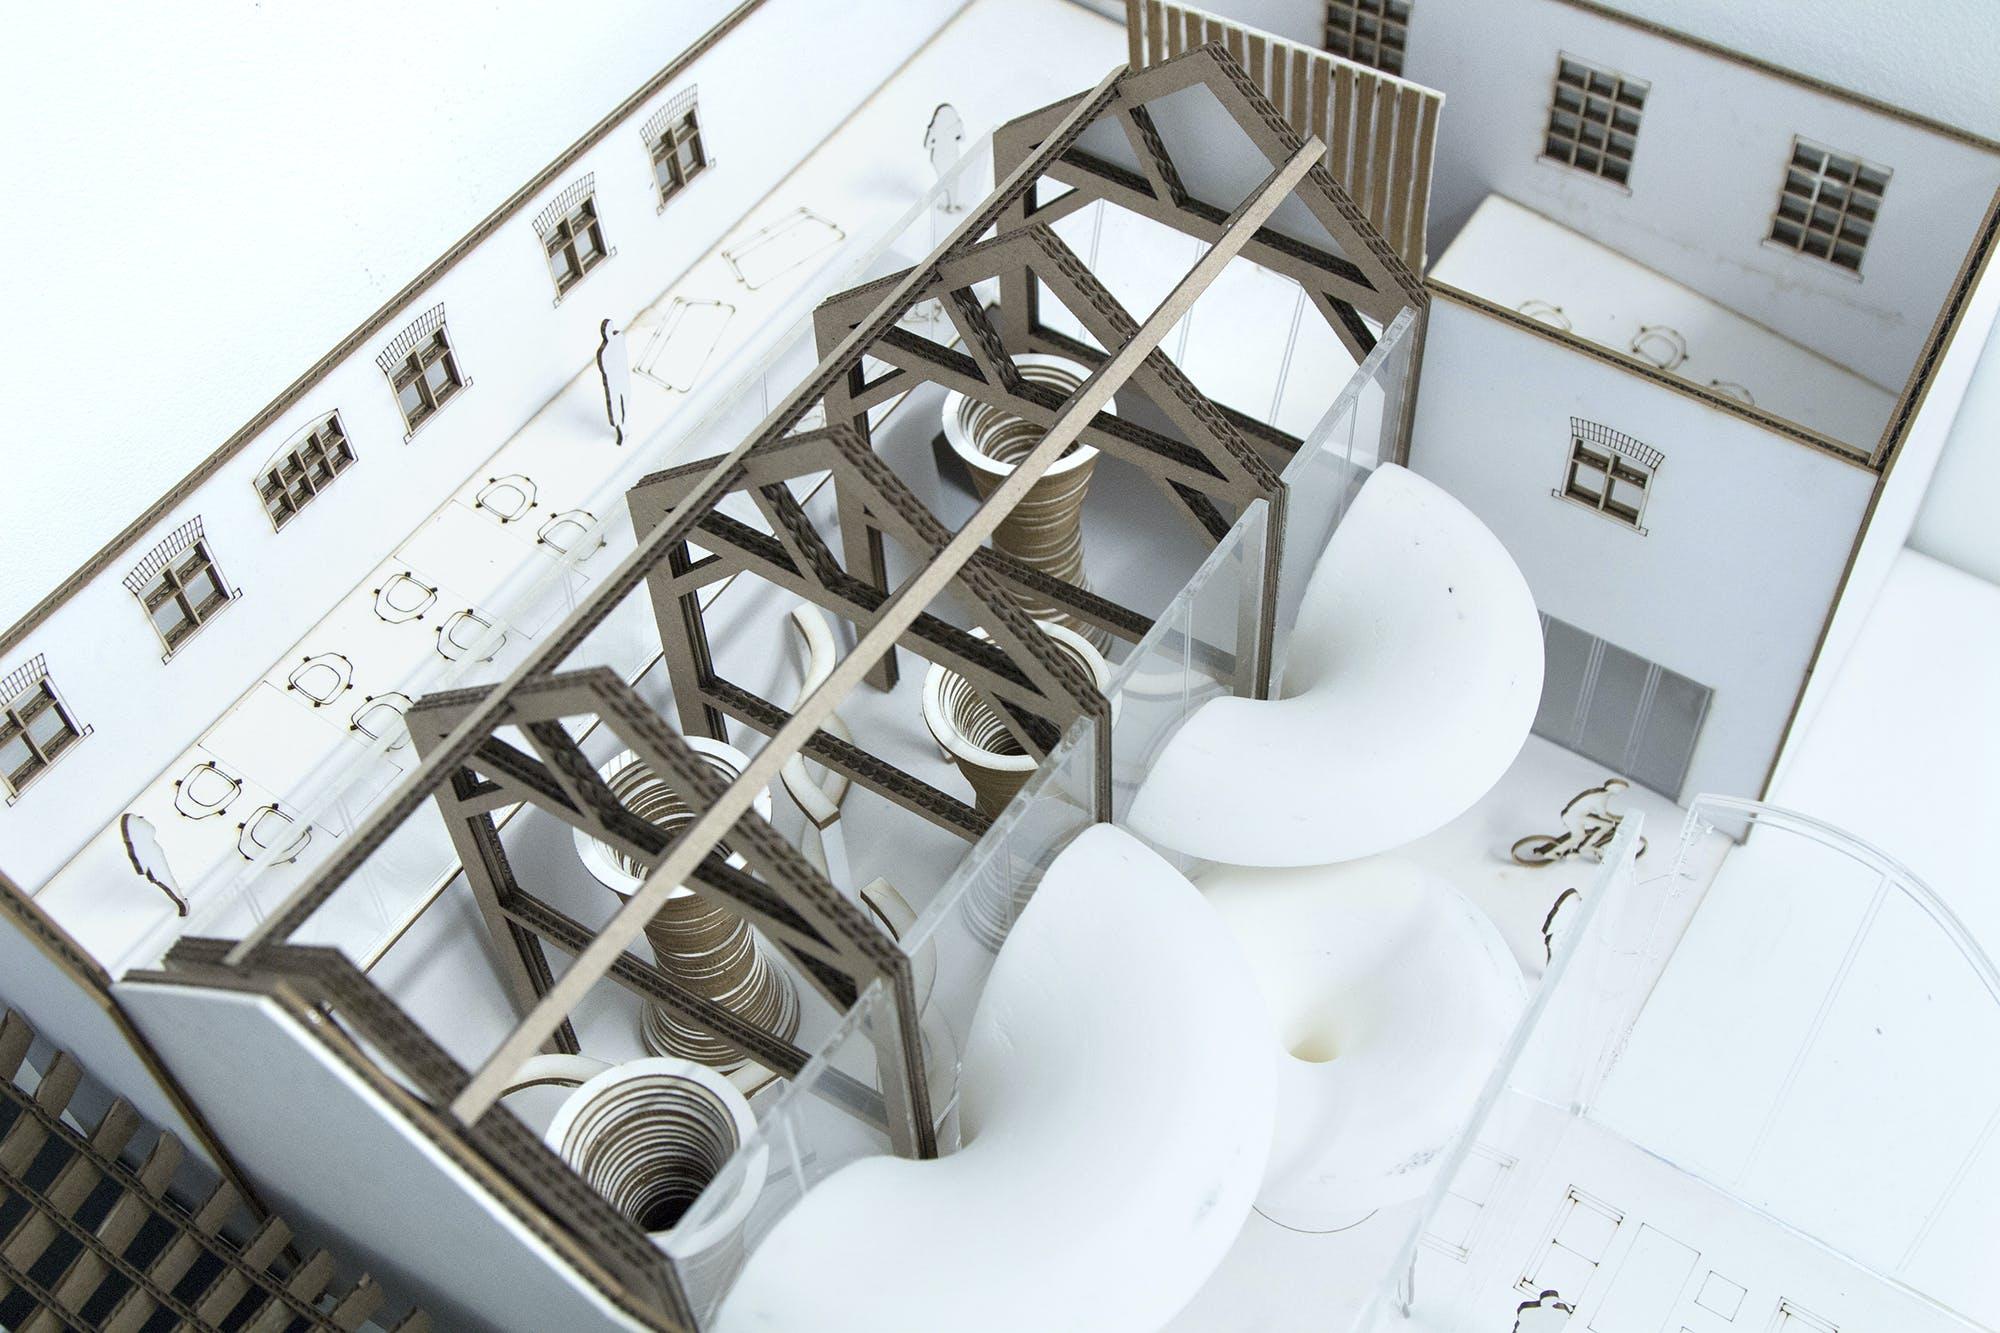 Interior architecture and design student work 4